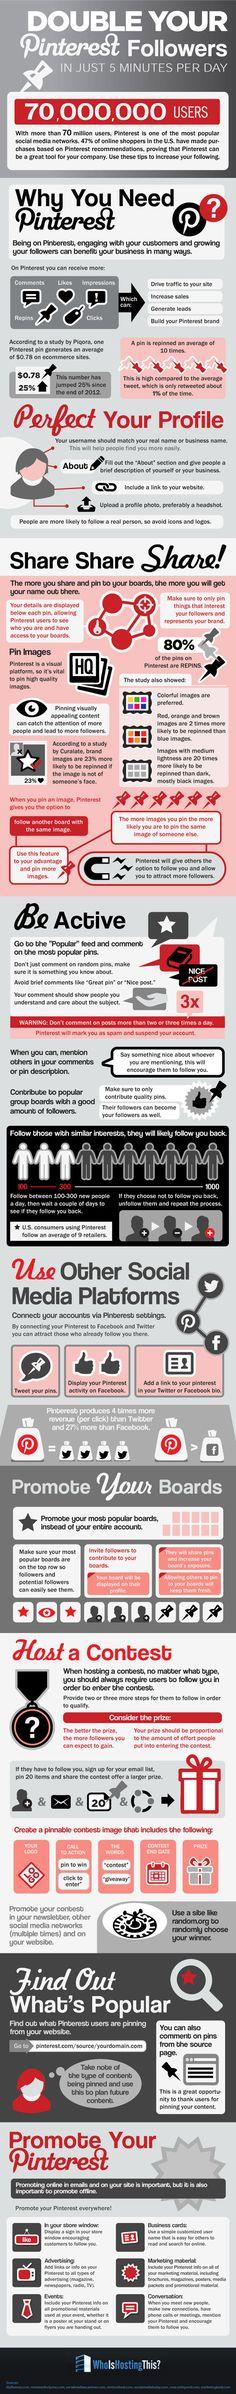 Double your Pinterest followers, an infographic: http://hosting.ber-art.nl/double-pinterest-followers-infographic /@BerriePelser - #Pin